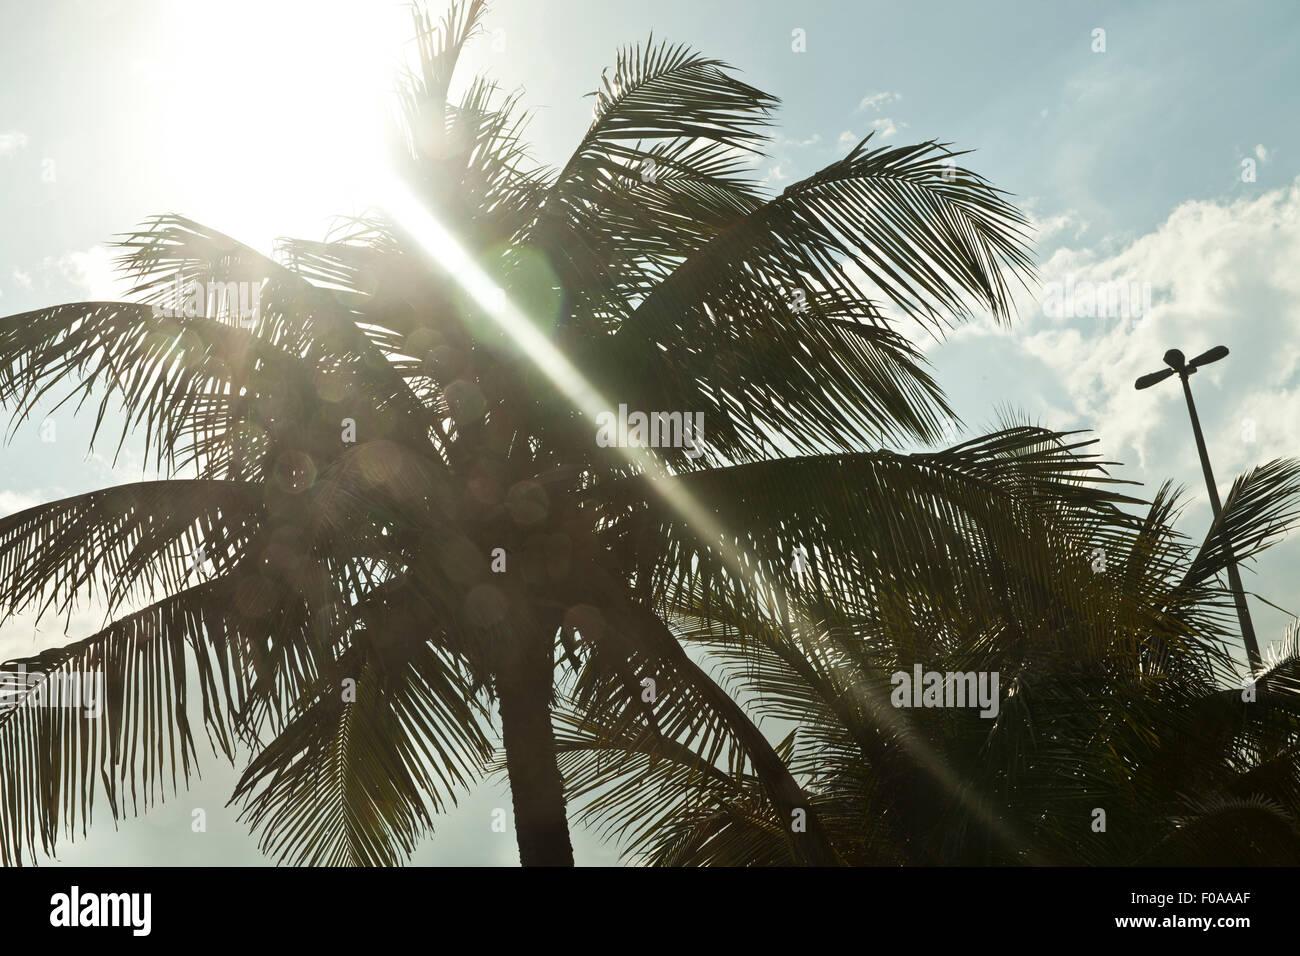 Palme e sole, Rio de Janeiro, Brasile Immagini Stock